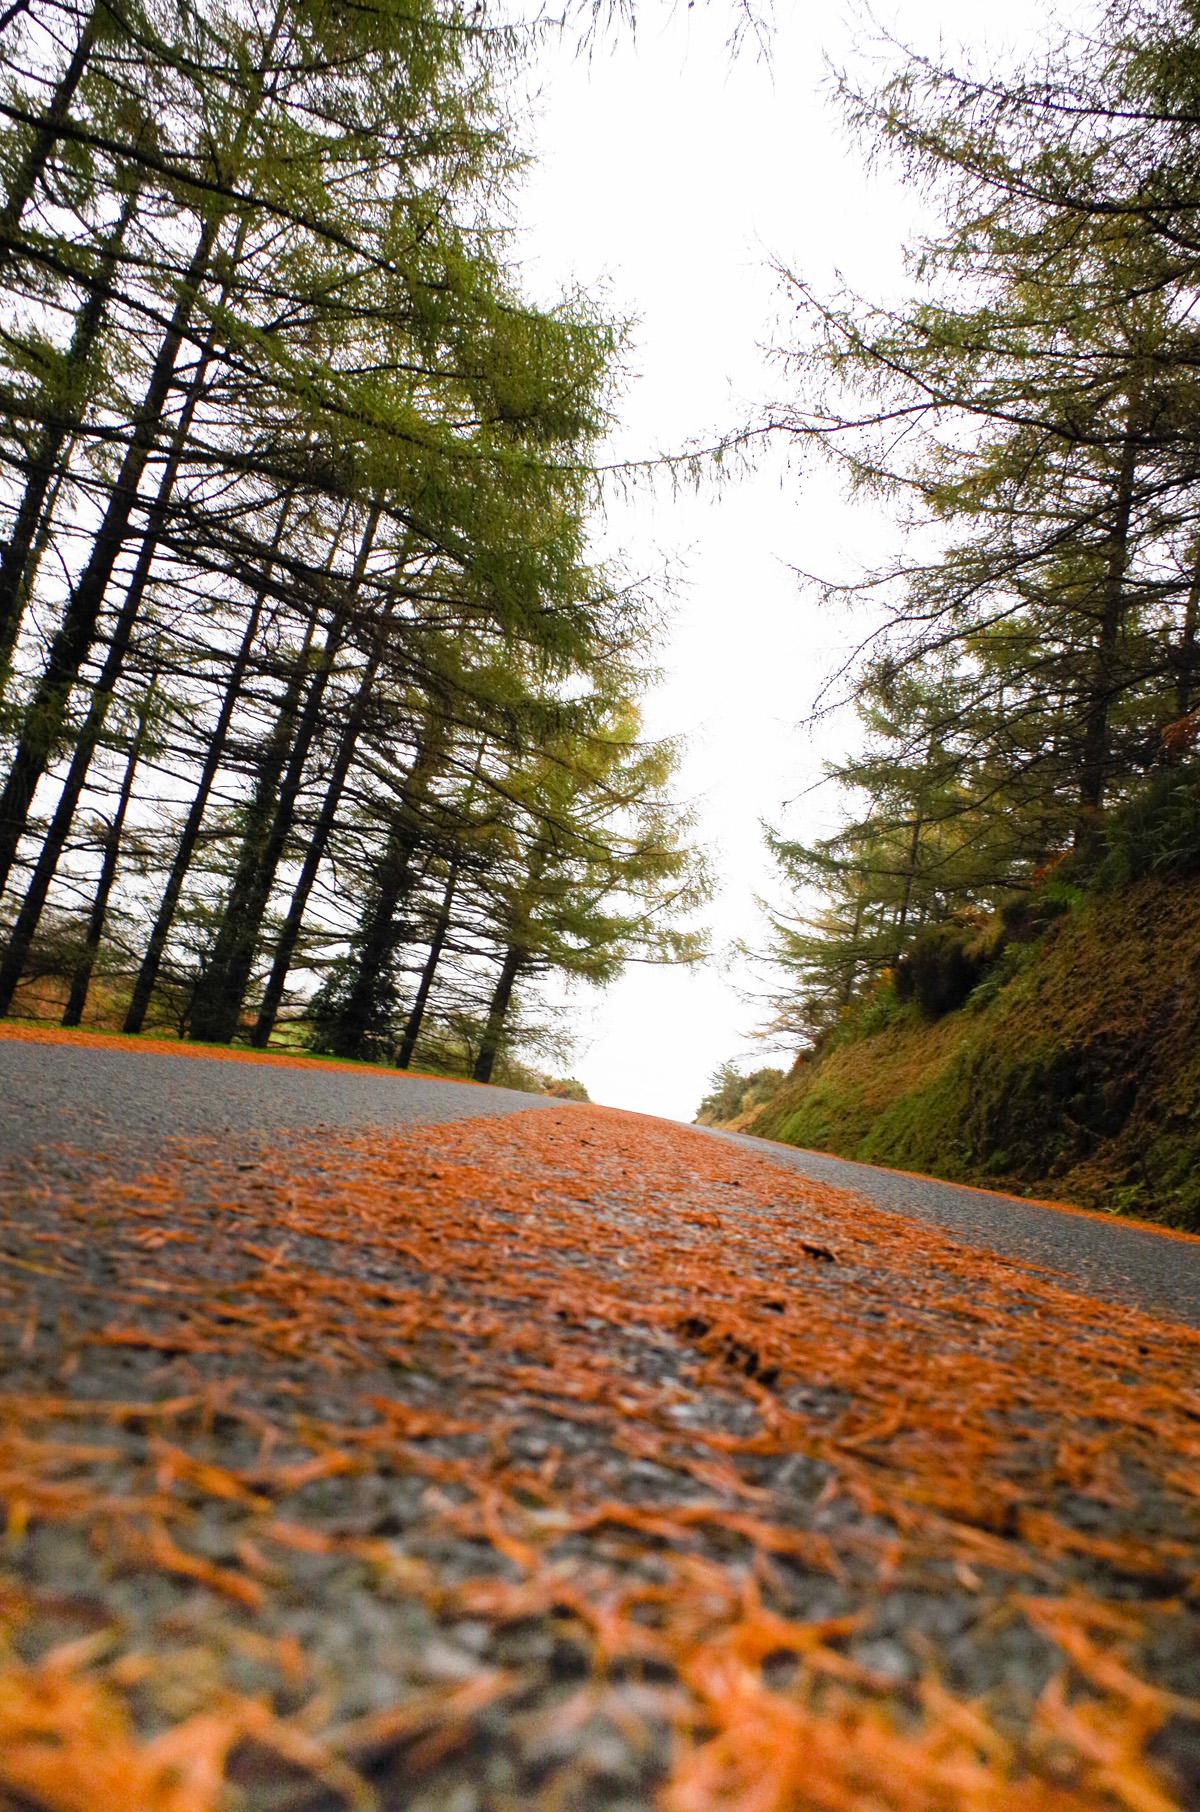 Carretera en otoño. Valle del Baztán